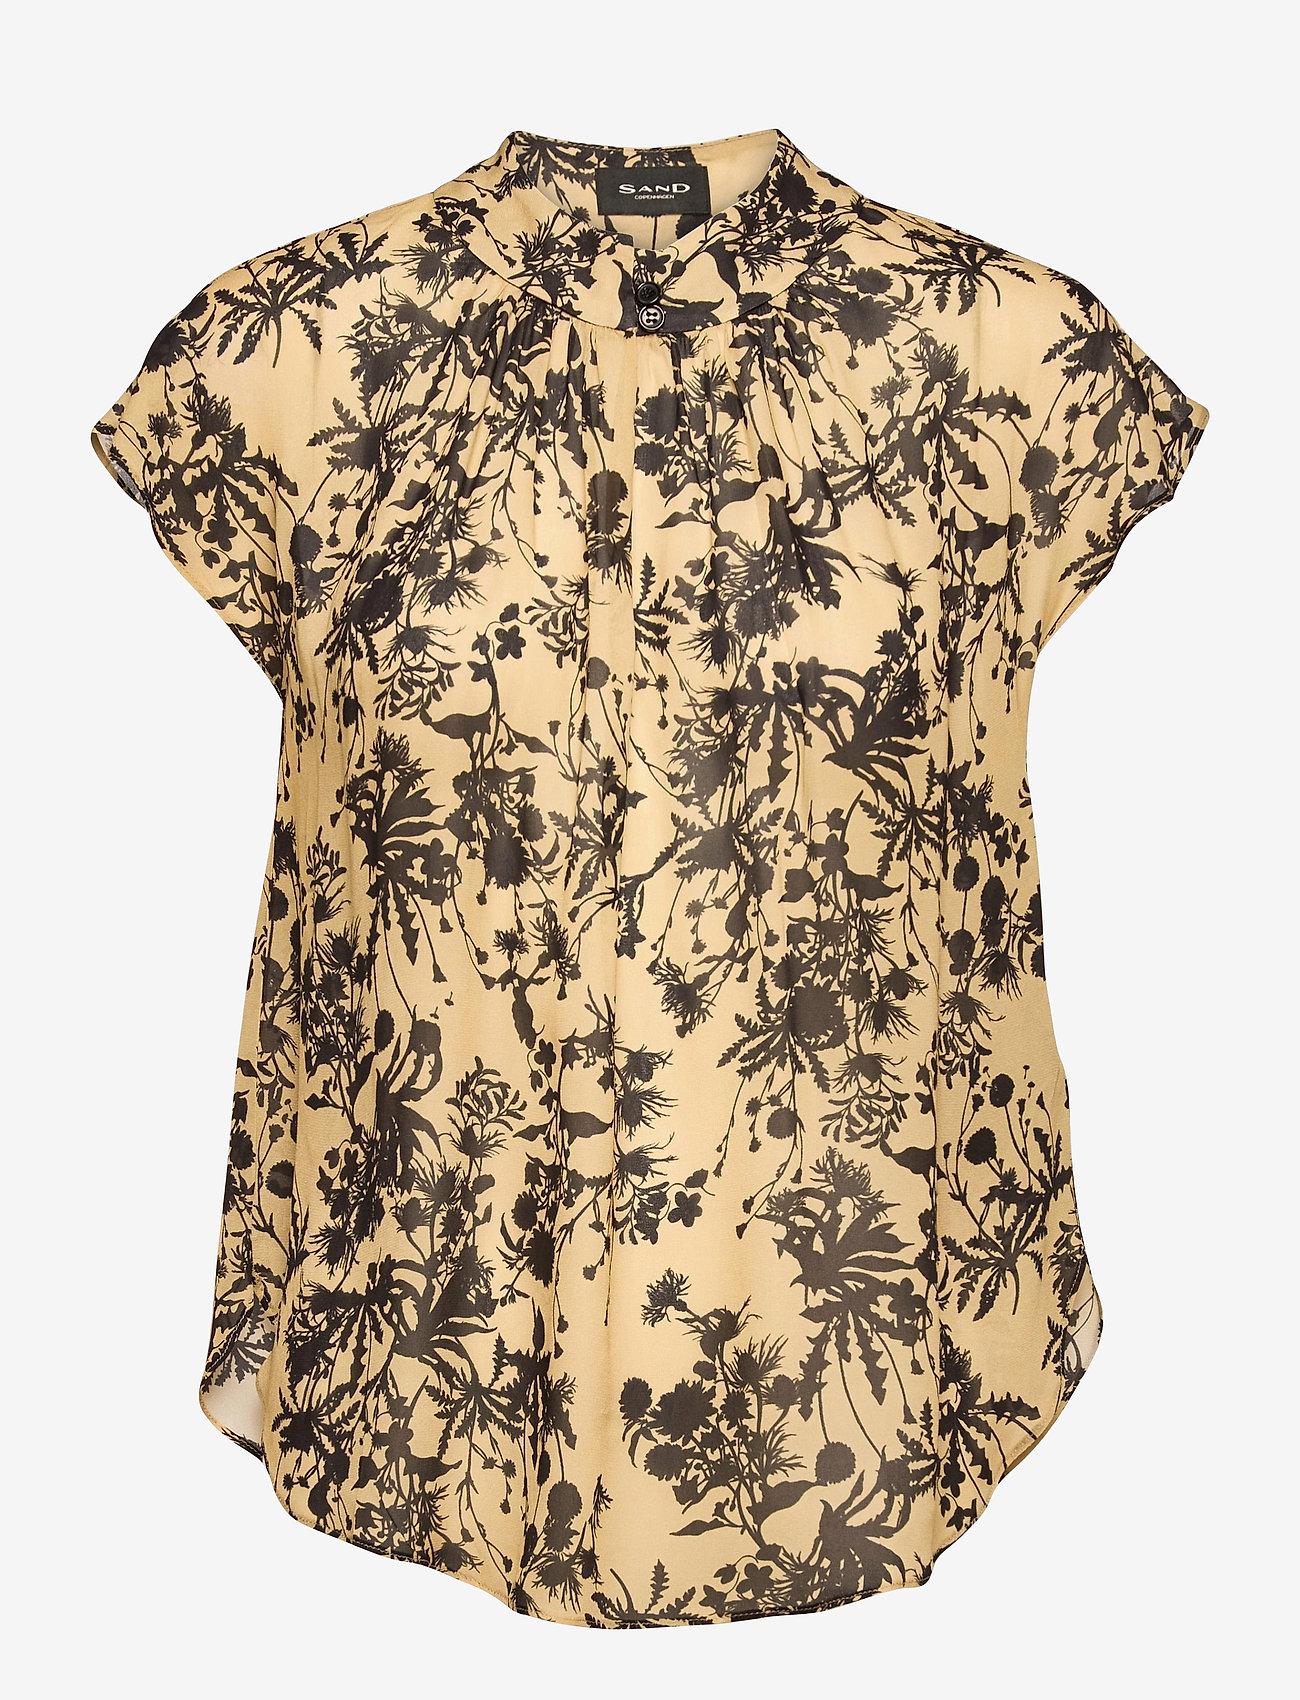 SAND - 3430 - Prosi Top S - blouses met korte mouwen - pale yellow - 0